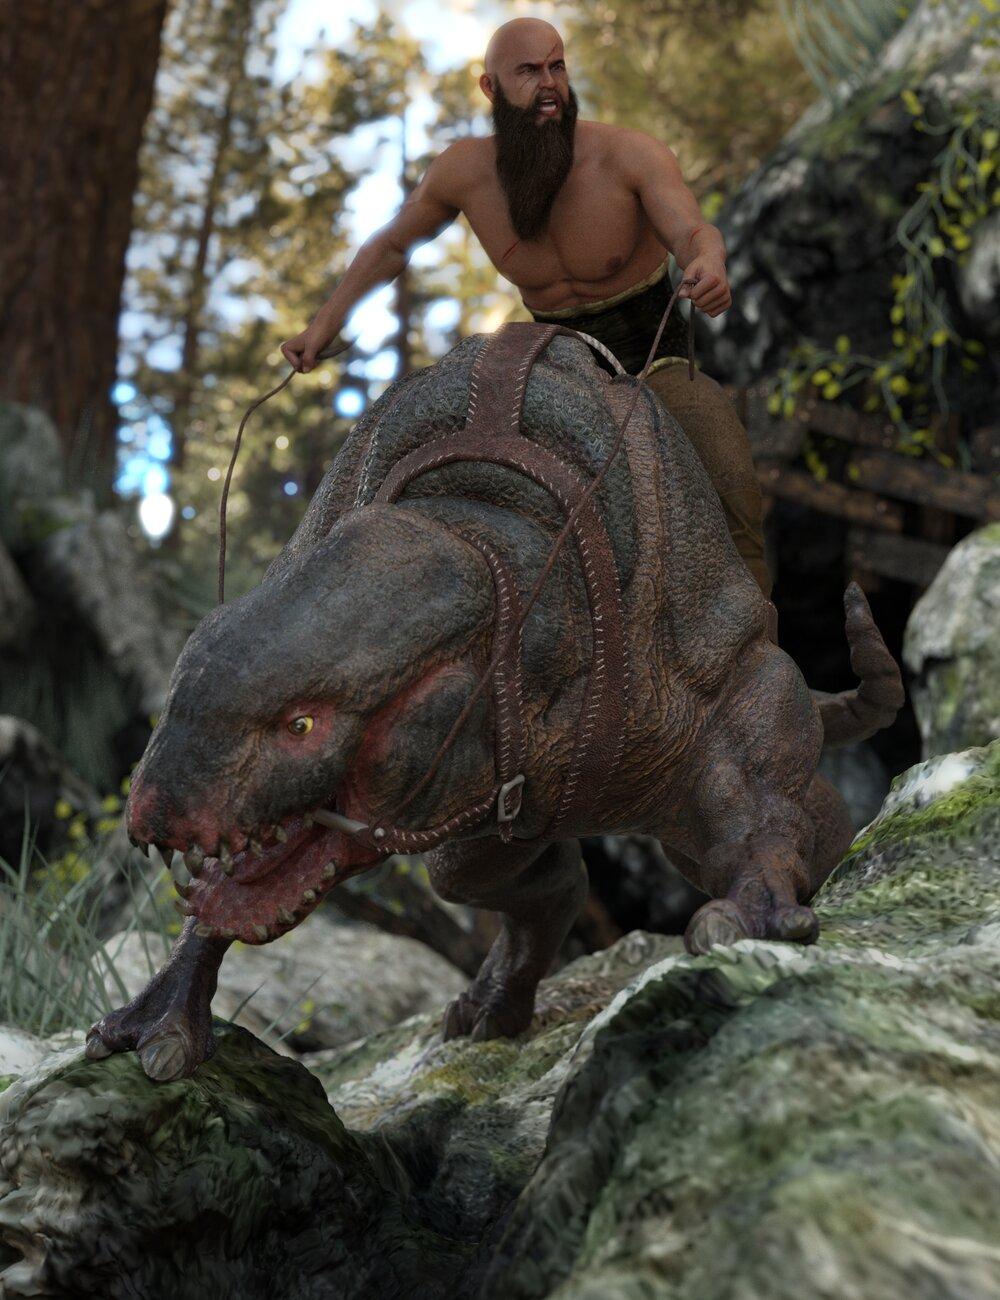 Rococerous HD Original Creature by: Sixus1 Media, 3D Models by Daz 3D